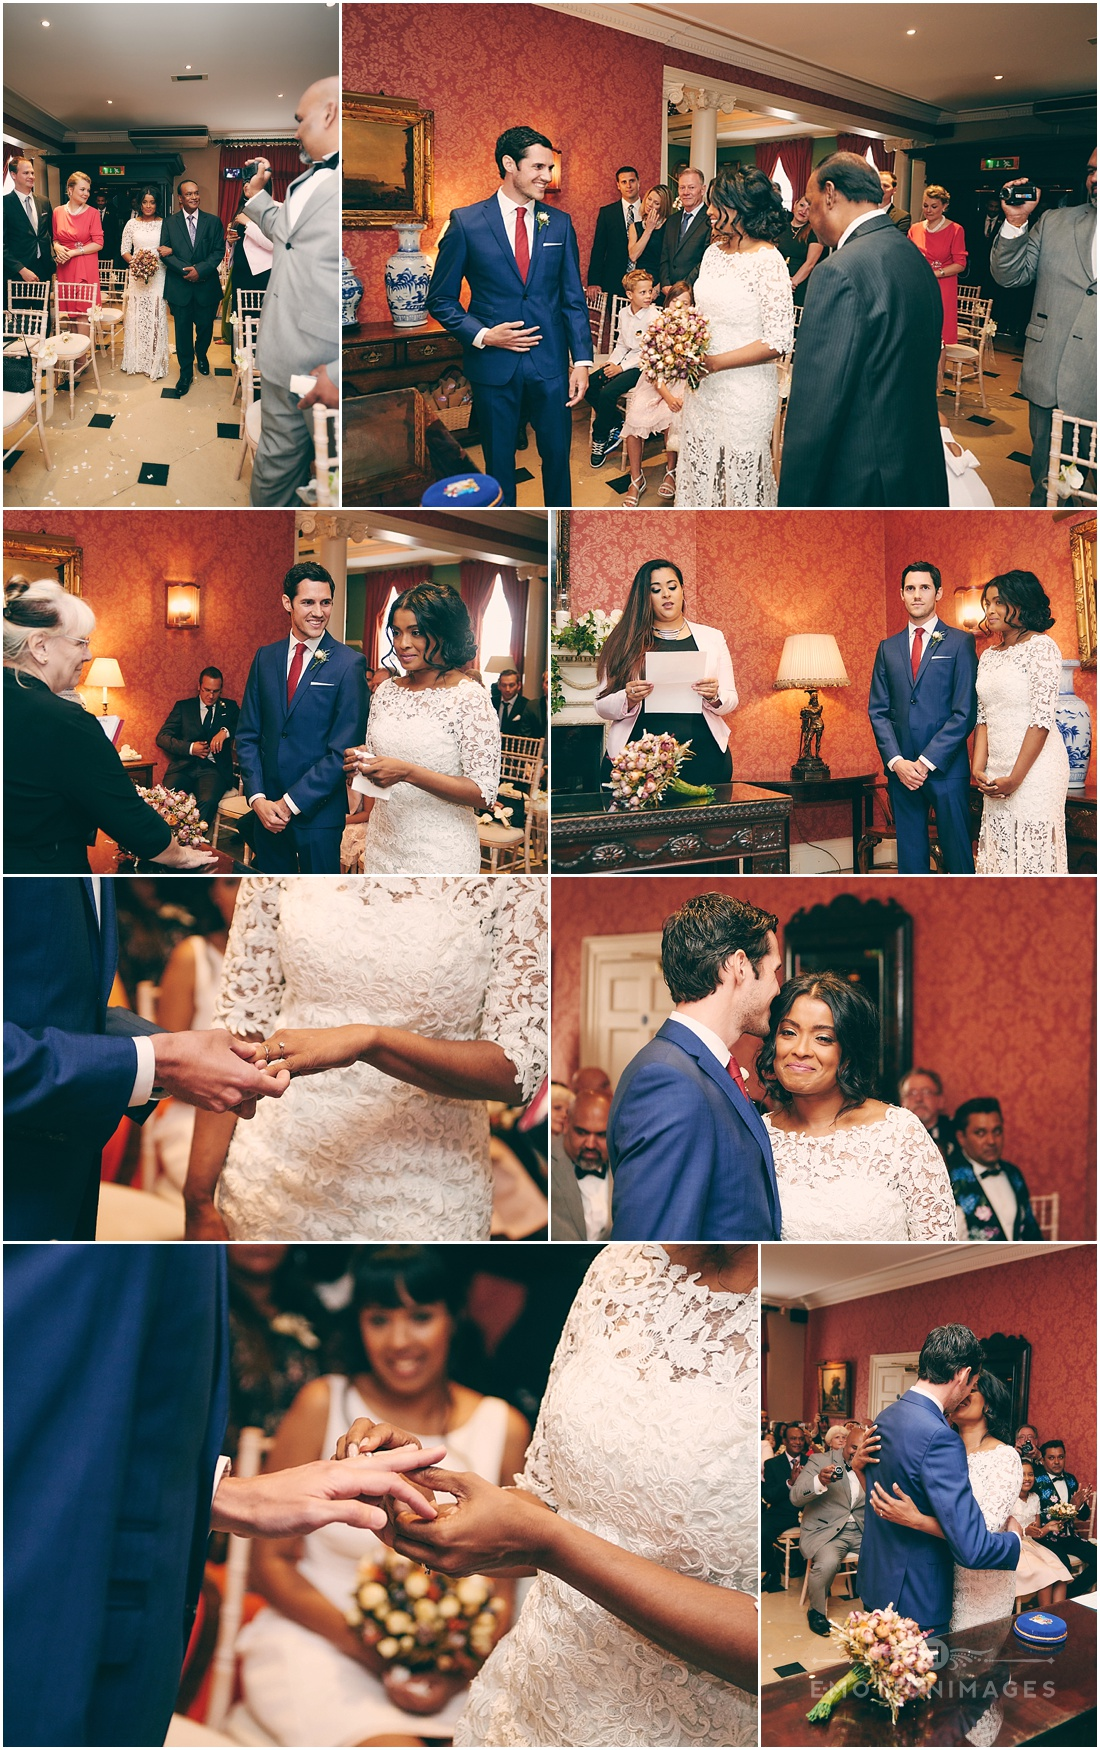 Searcys_Knightsbridge_London_wedding_e-motion_images_010.JPG